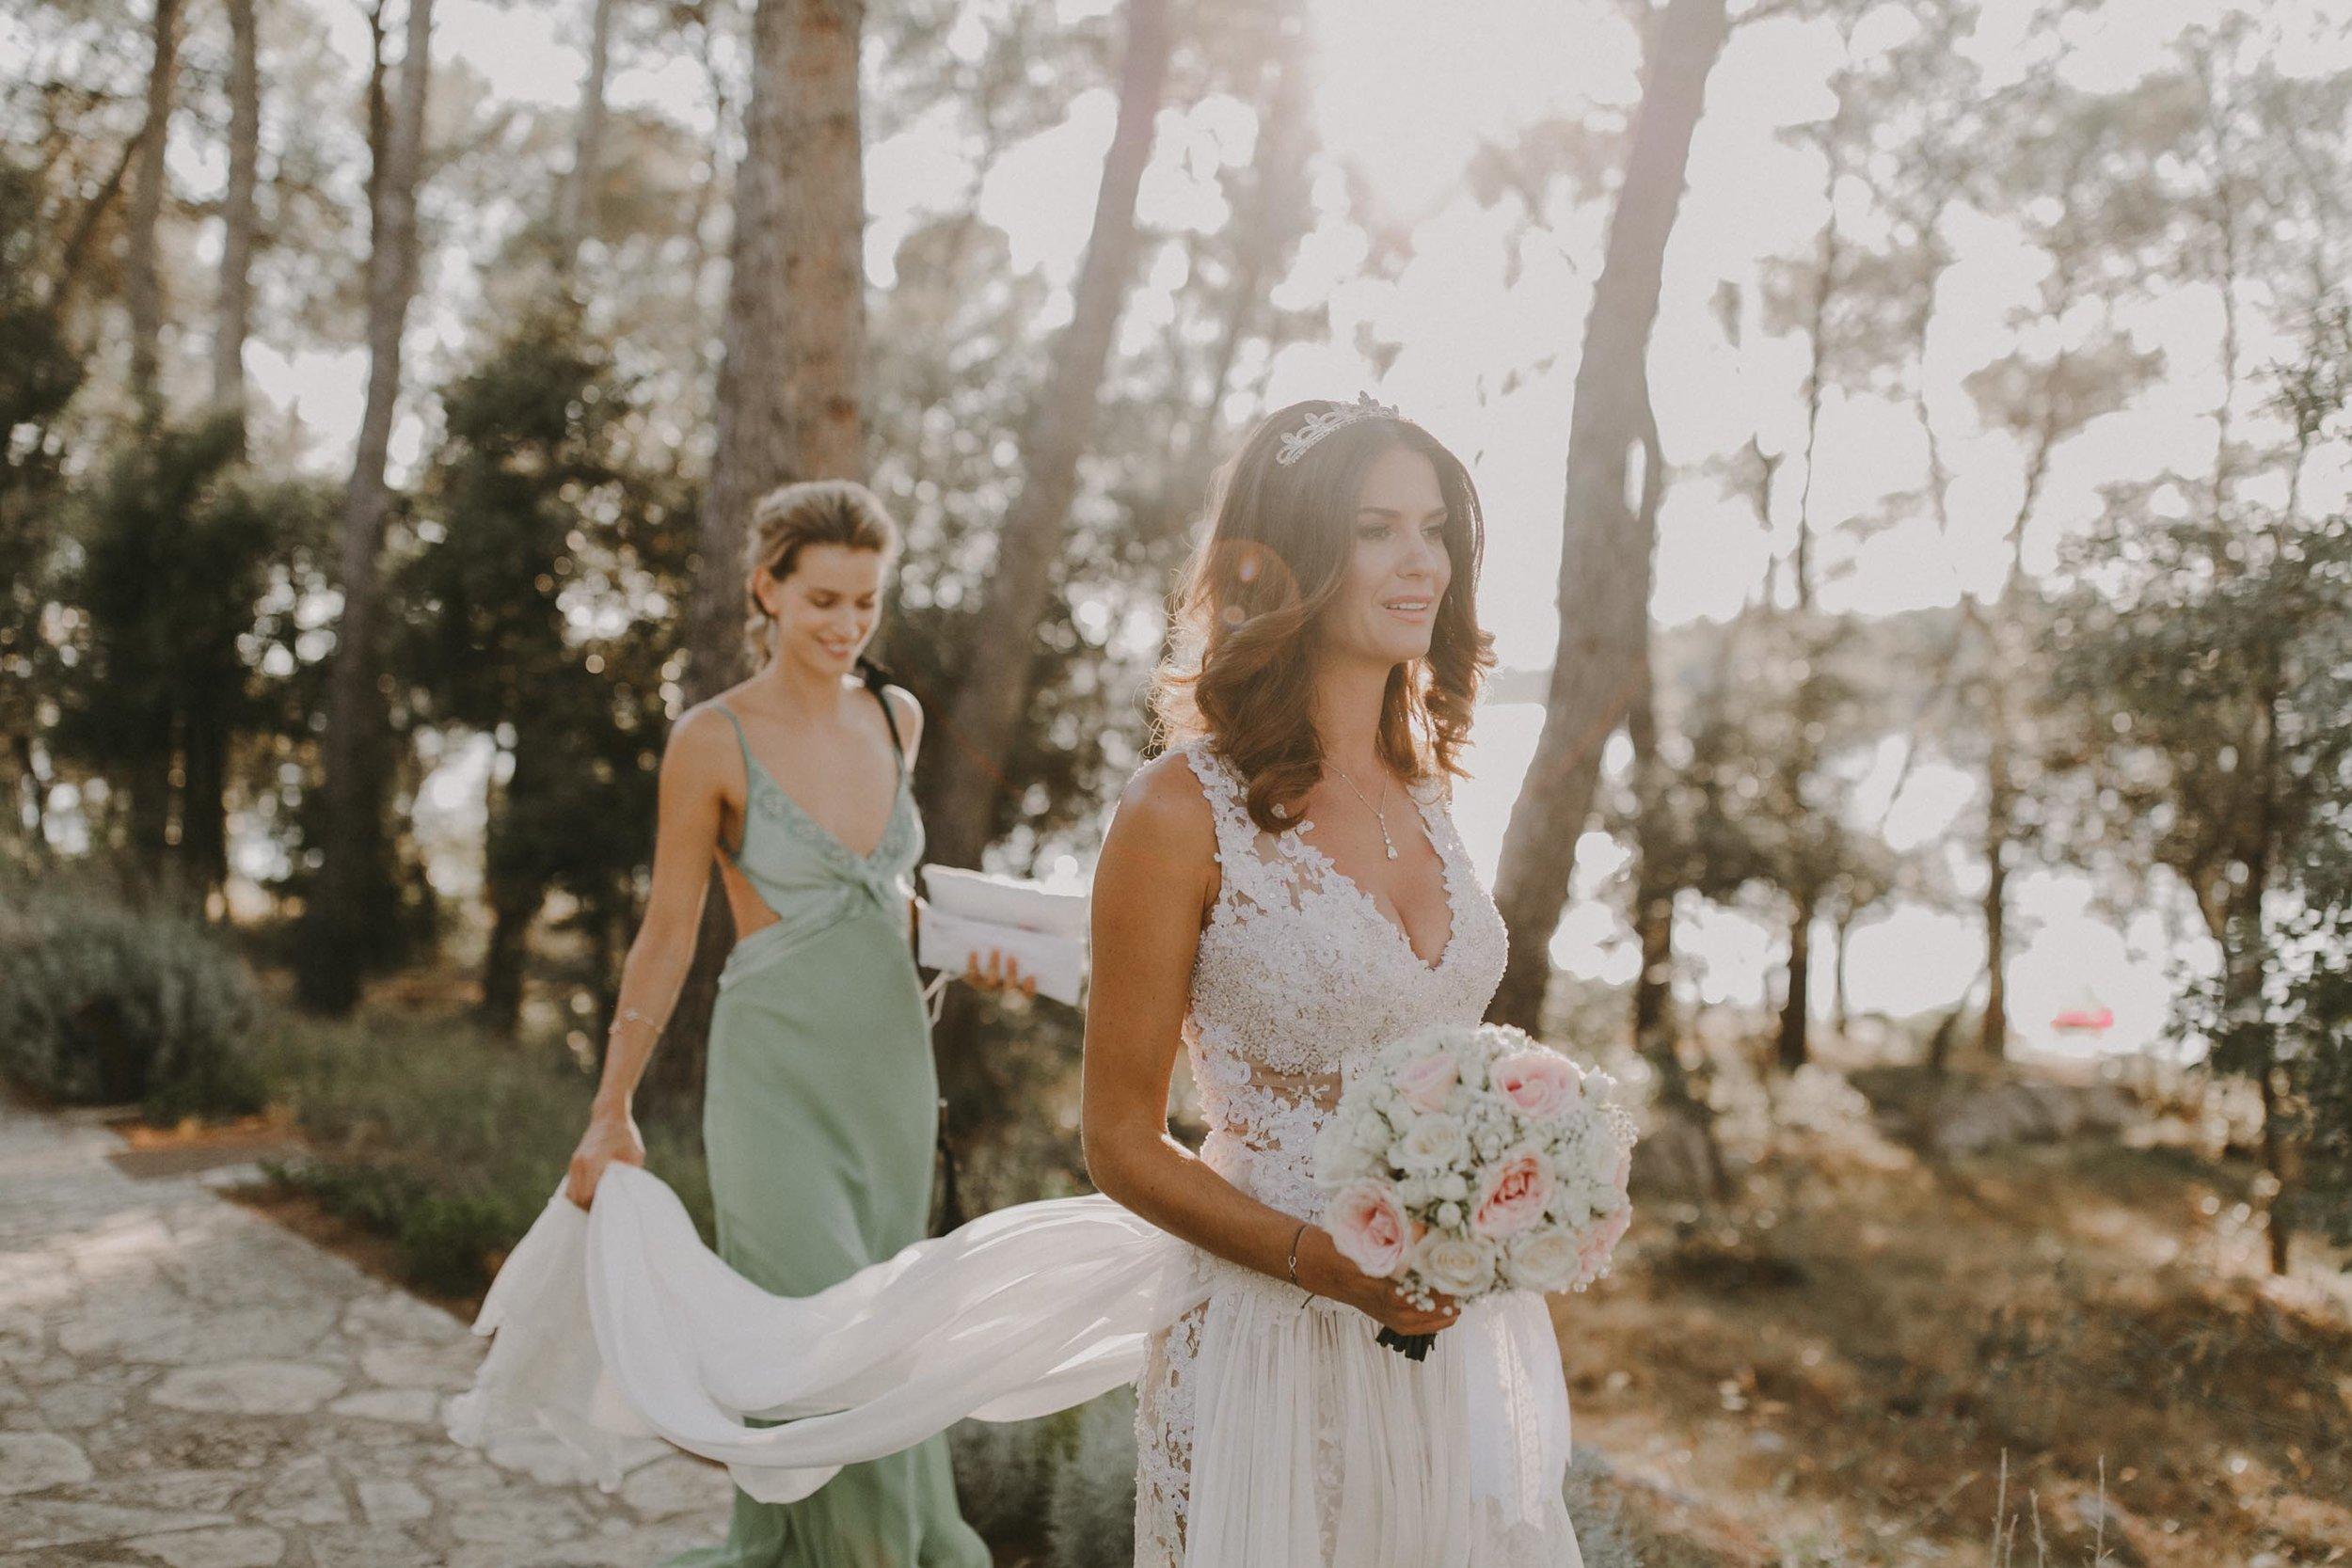 sylvia&dimitri-Wedding-Crvena_Luka-Croatia-35(7639).jpg